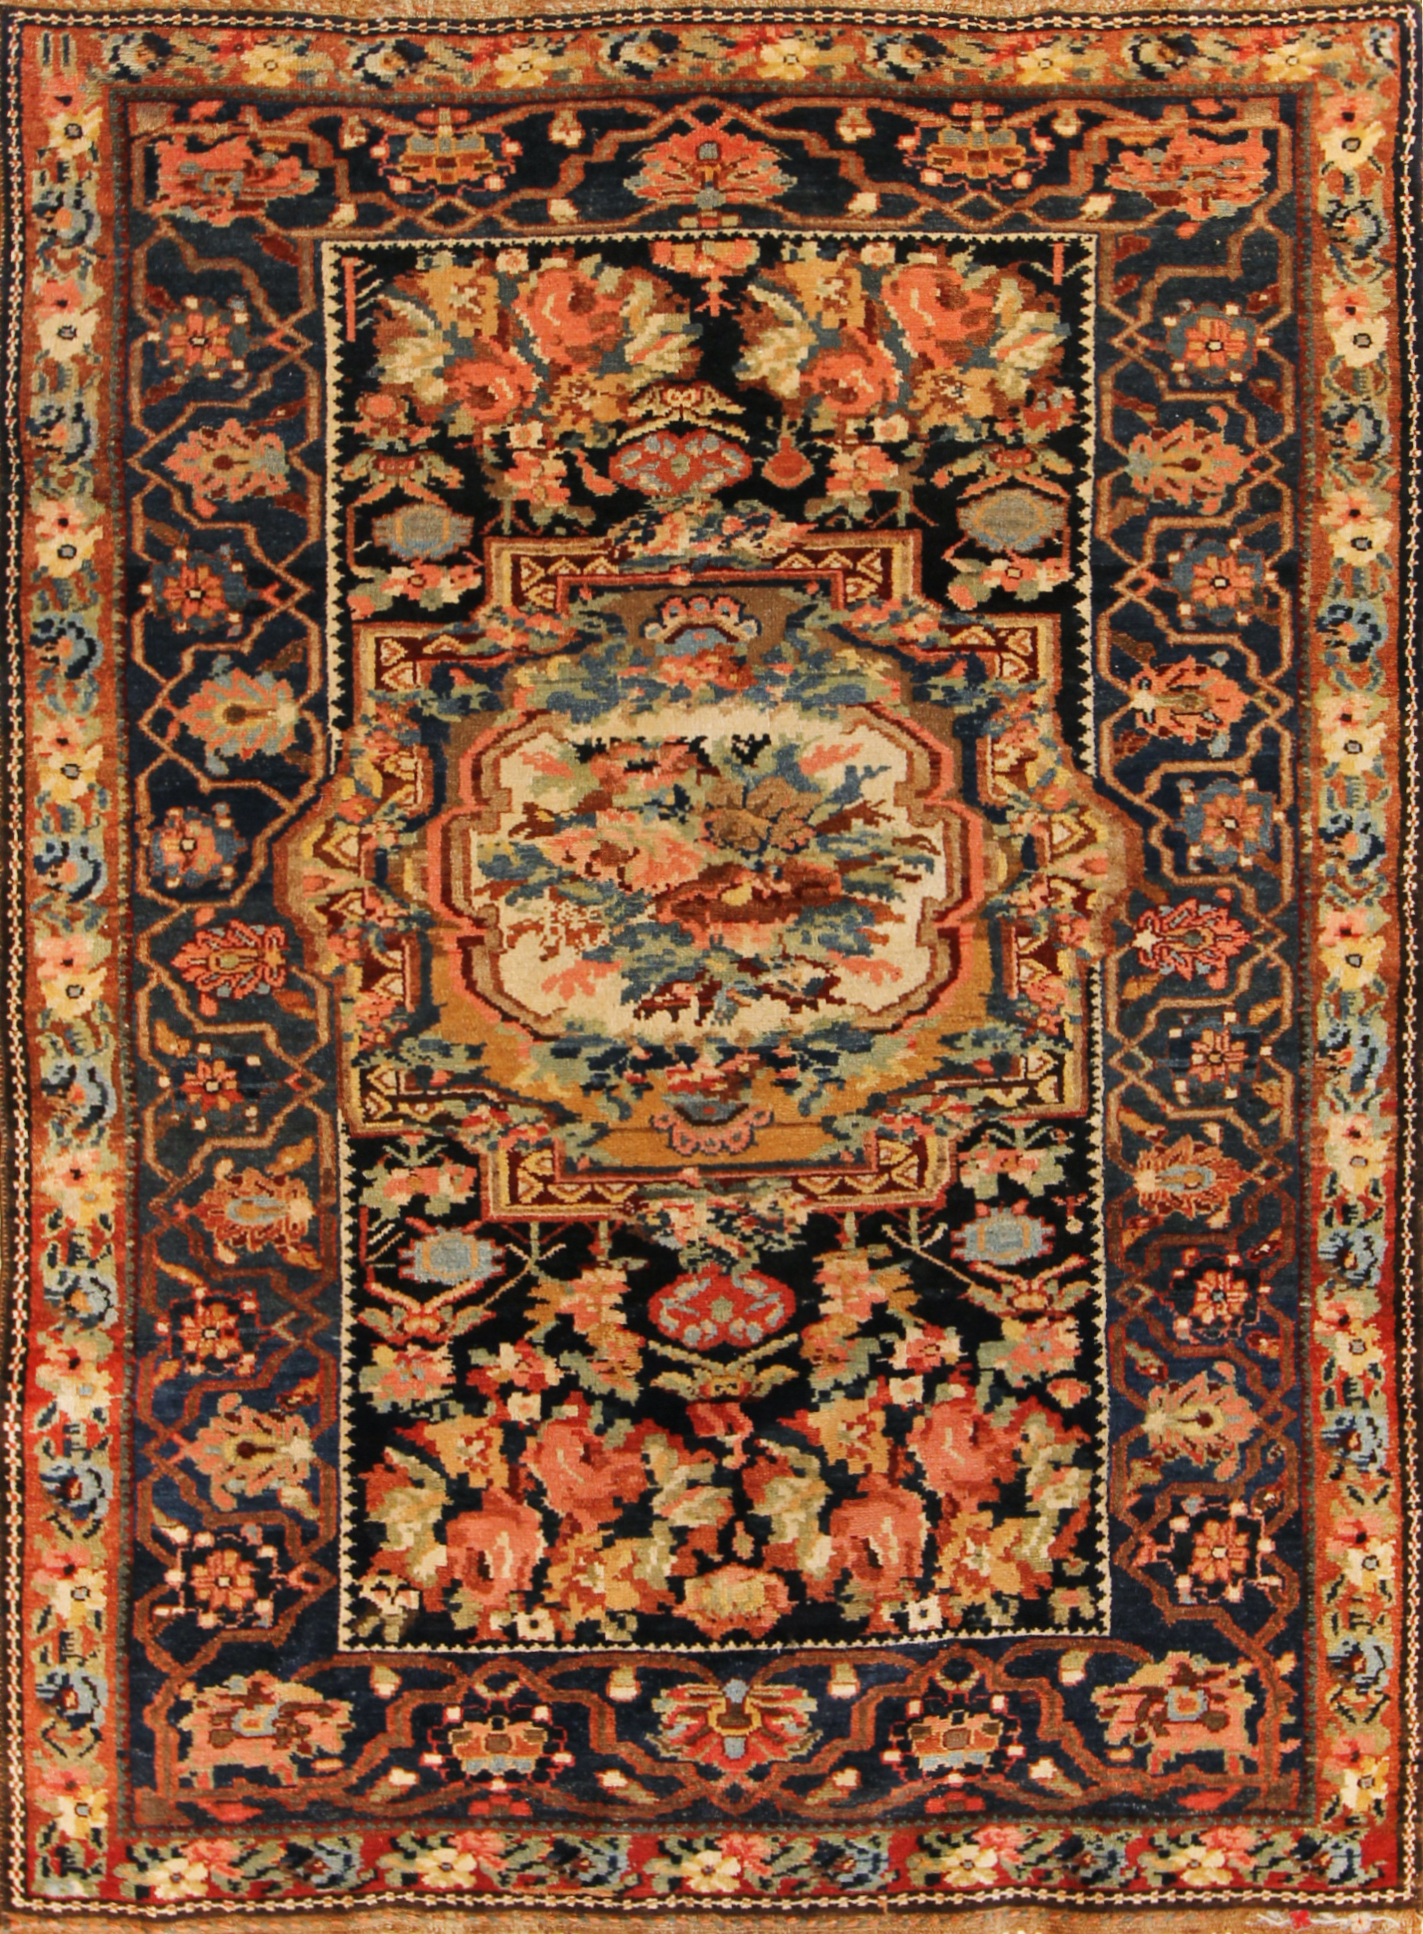 67 Armenian Village Carpet, Chahar Mahal, Iran, circa 1895, french influence, 4'8''x6'8''